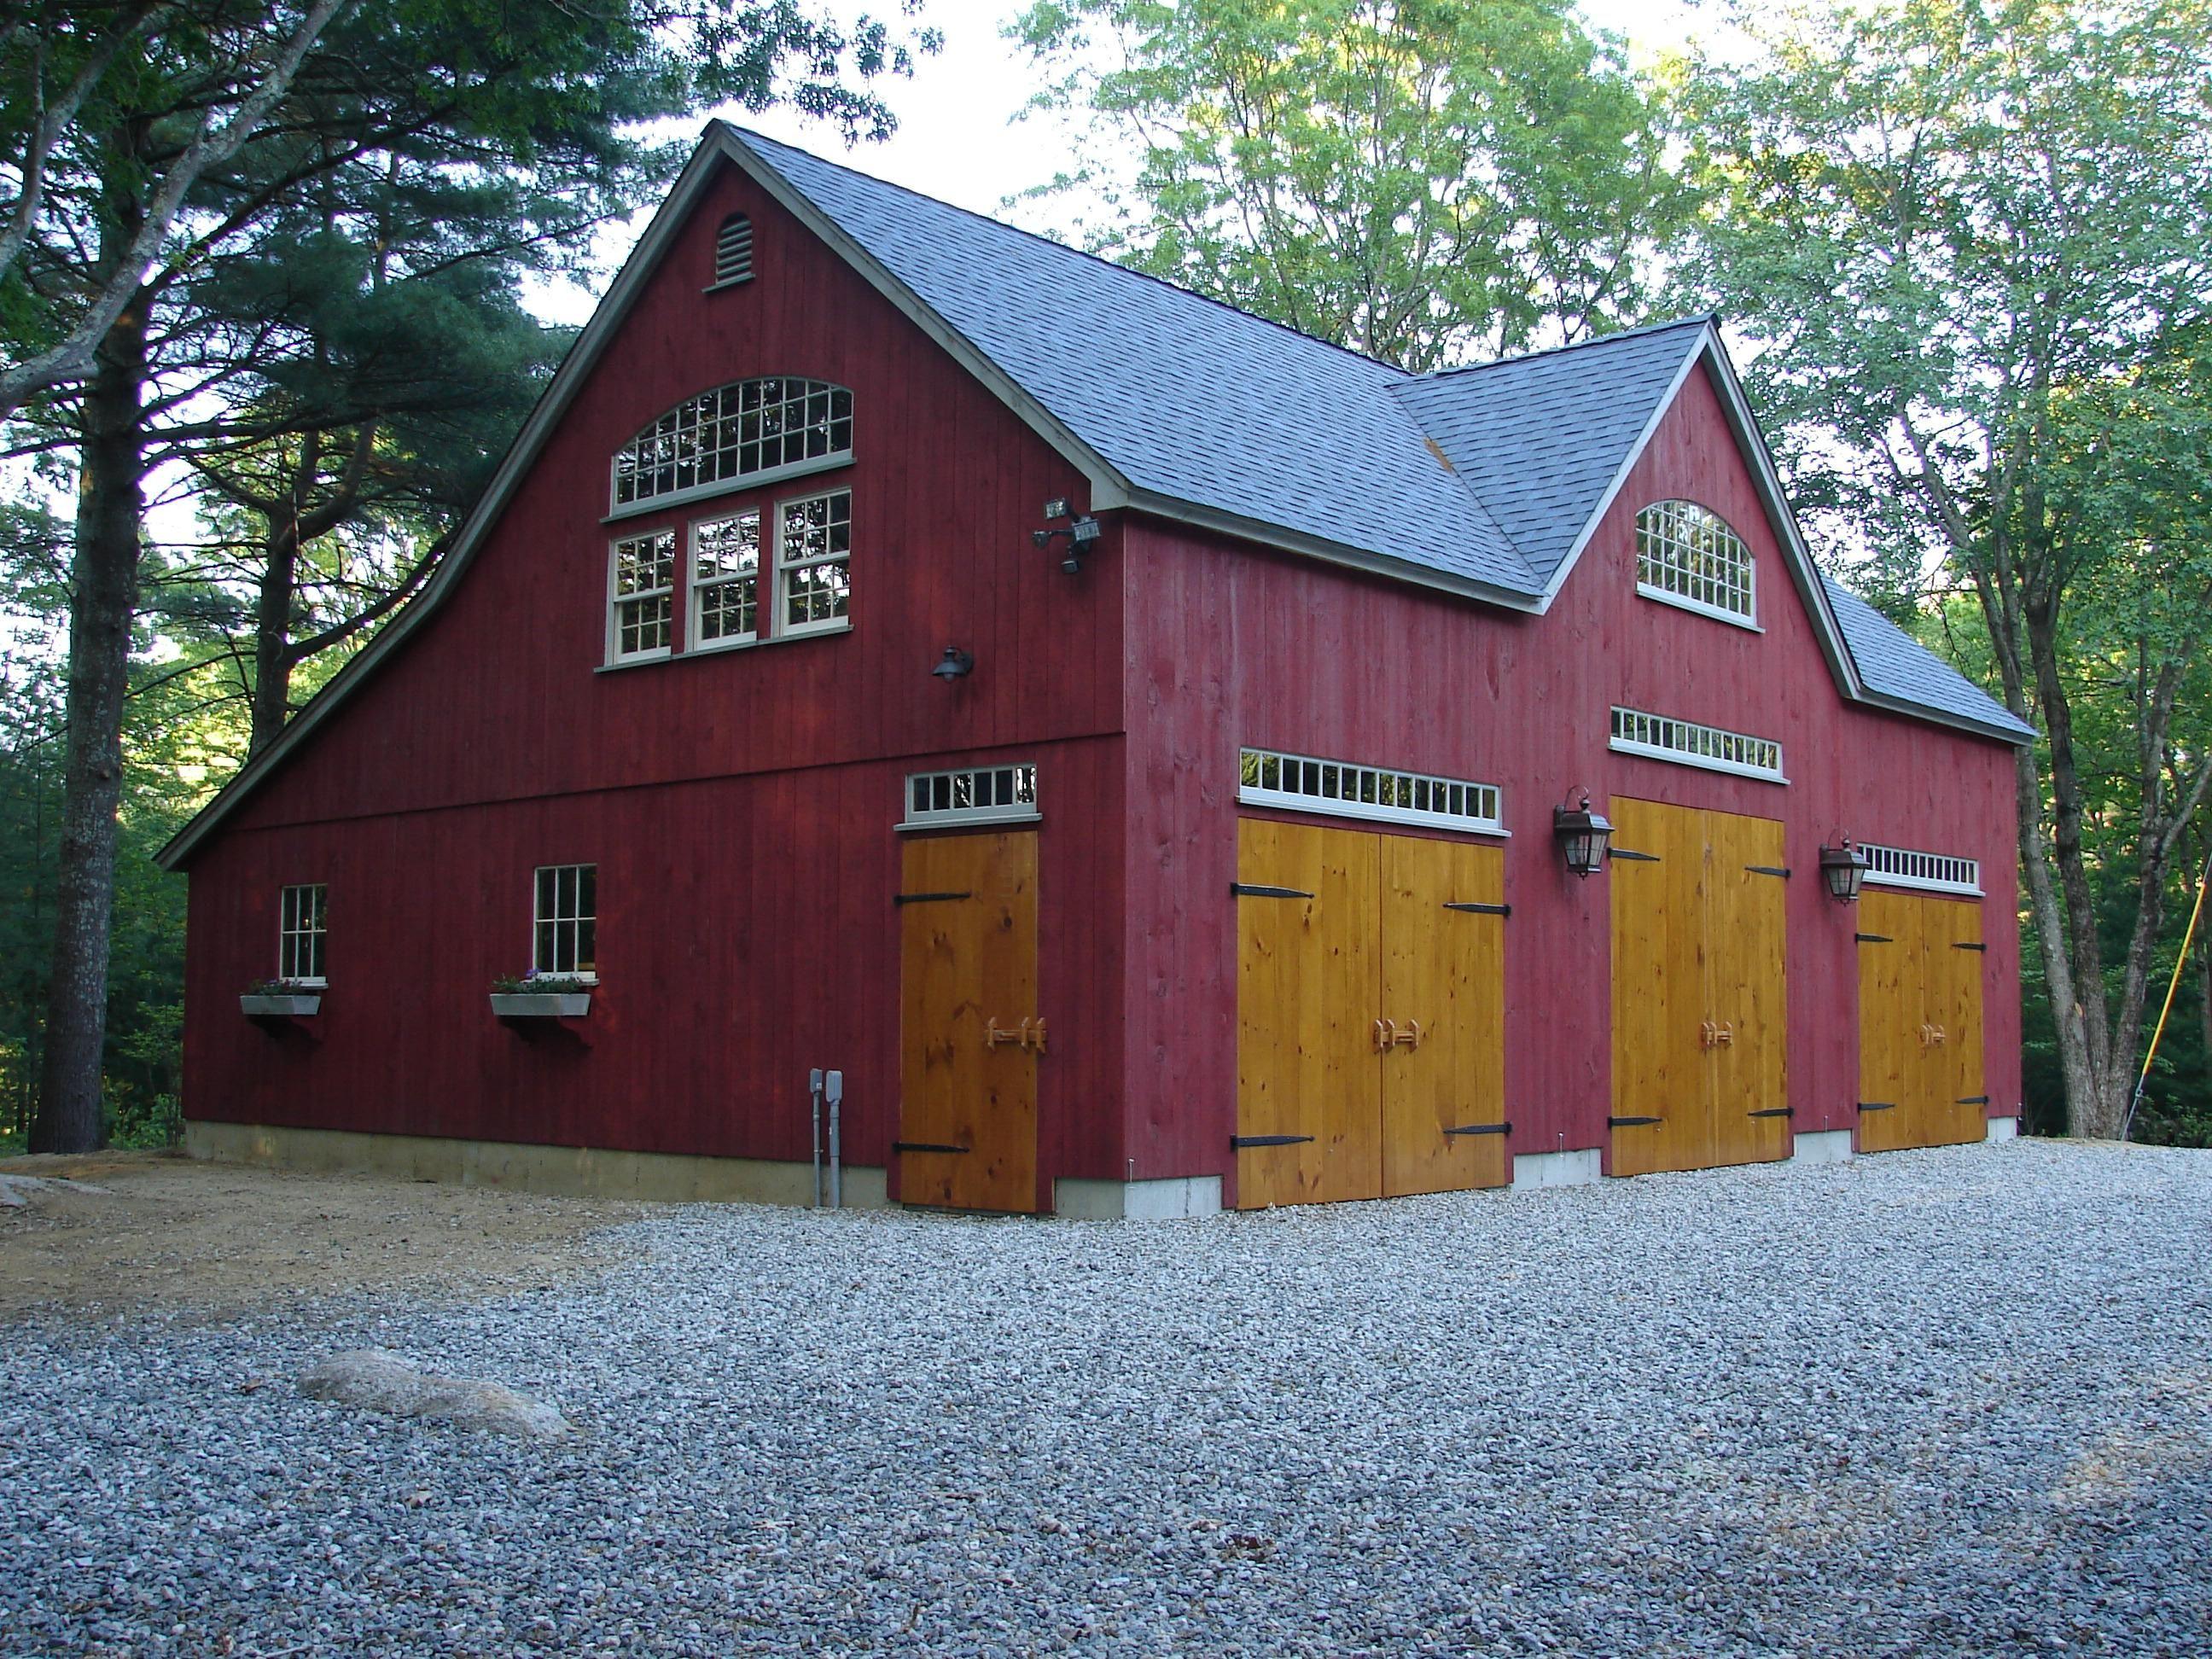 Vintage timber frame barn addition farmhouse exterior burlington - Our 22 X 42 1 1 2 Story Barn With 12